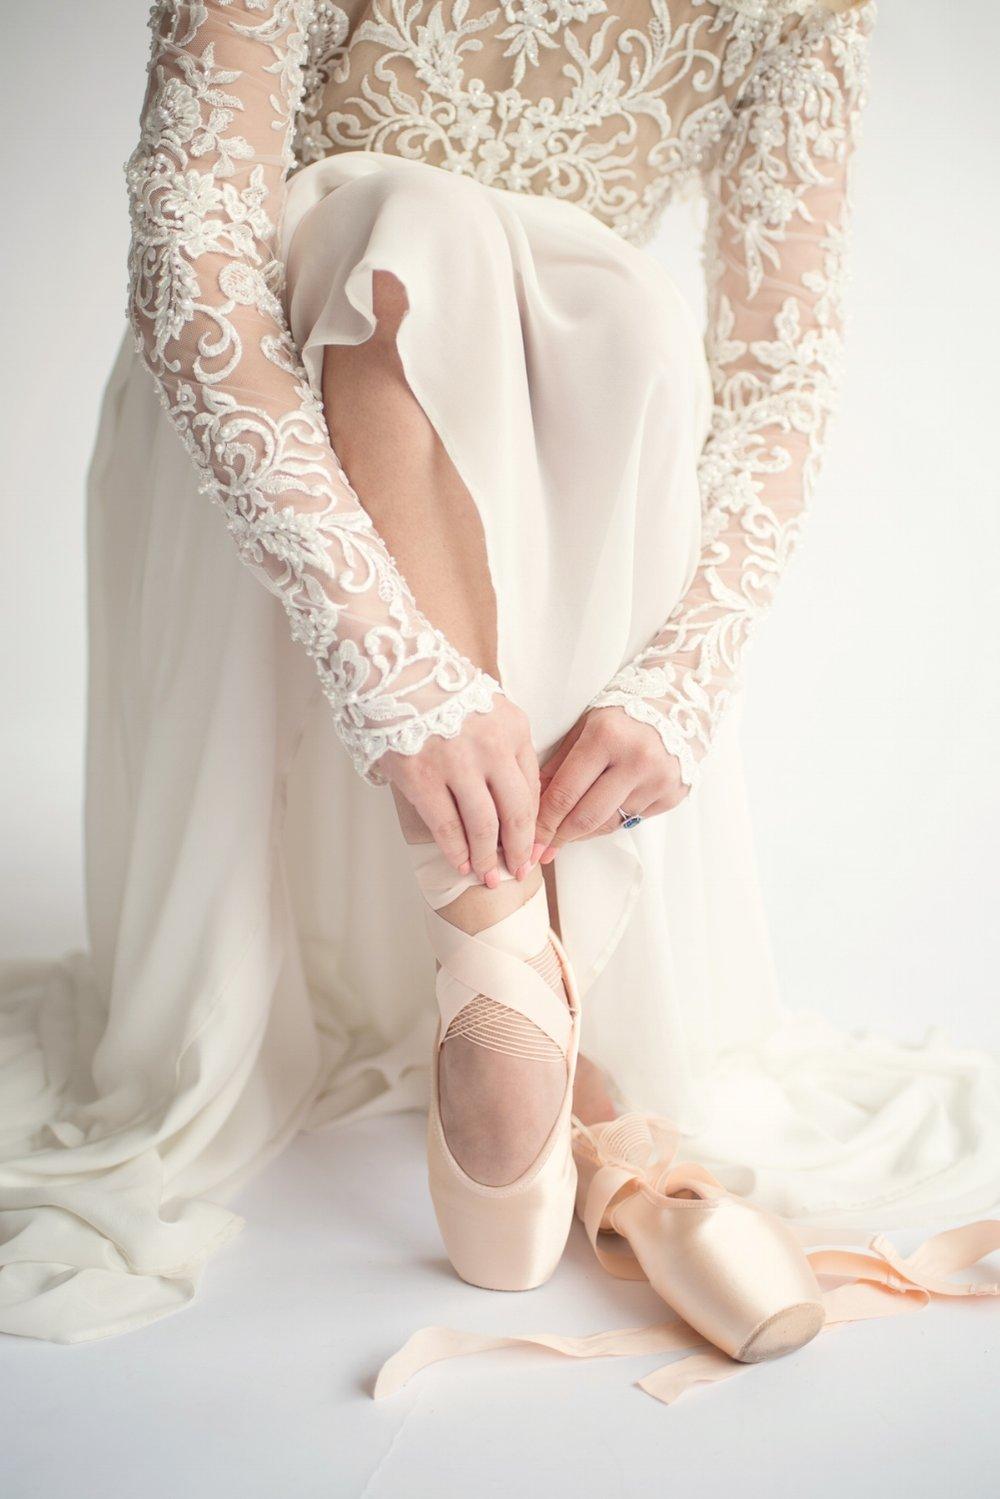 Ballet bridal editorial_Eva Tarnok Photography_34.jpg